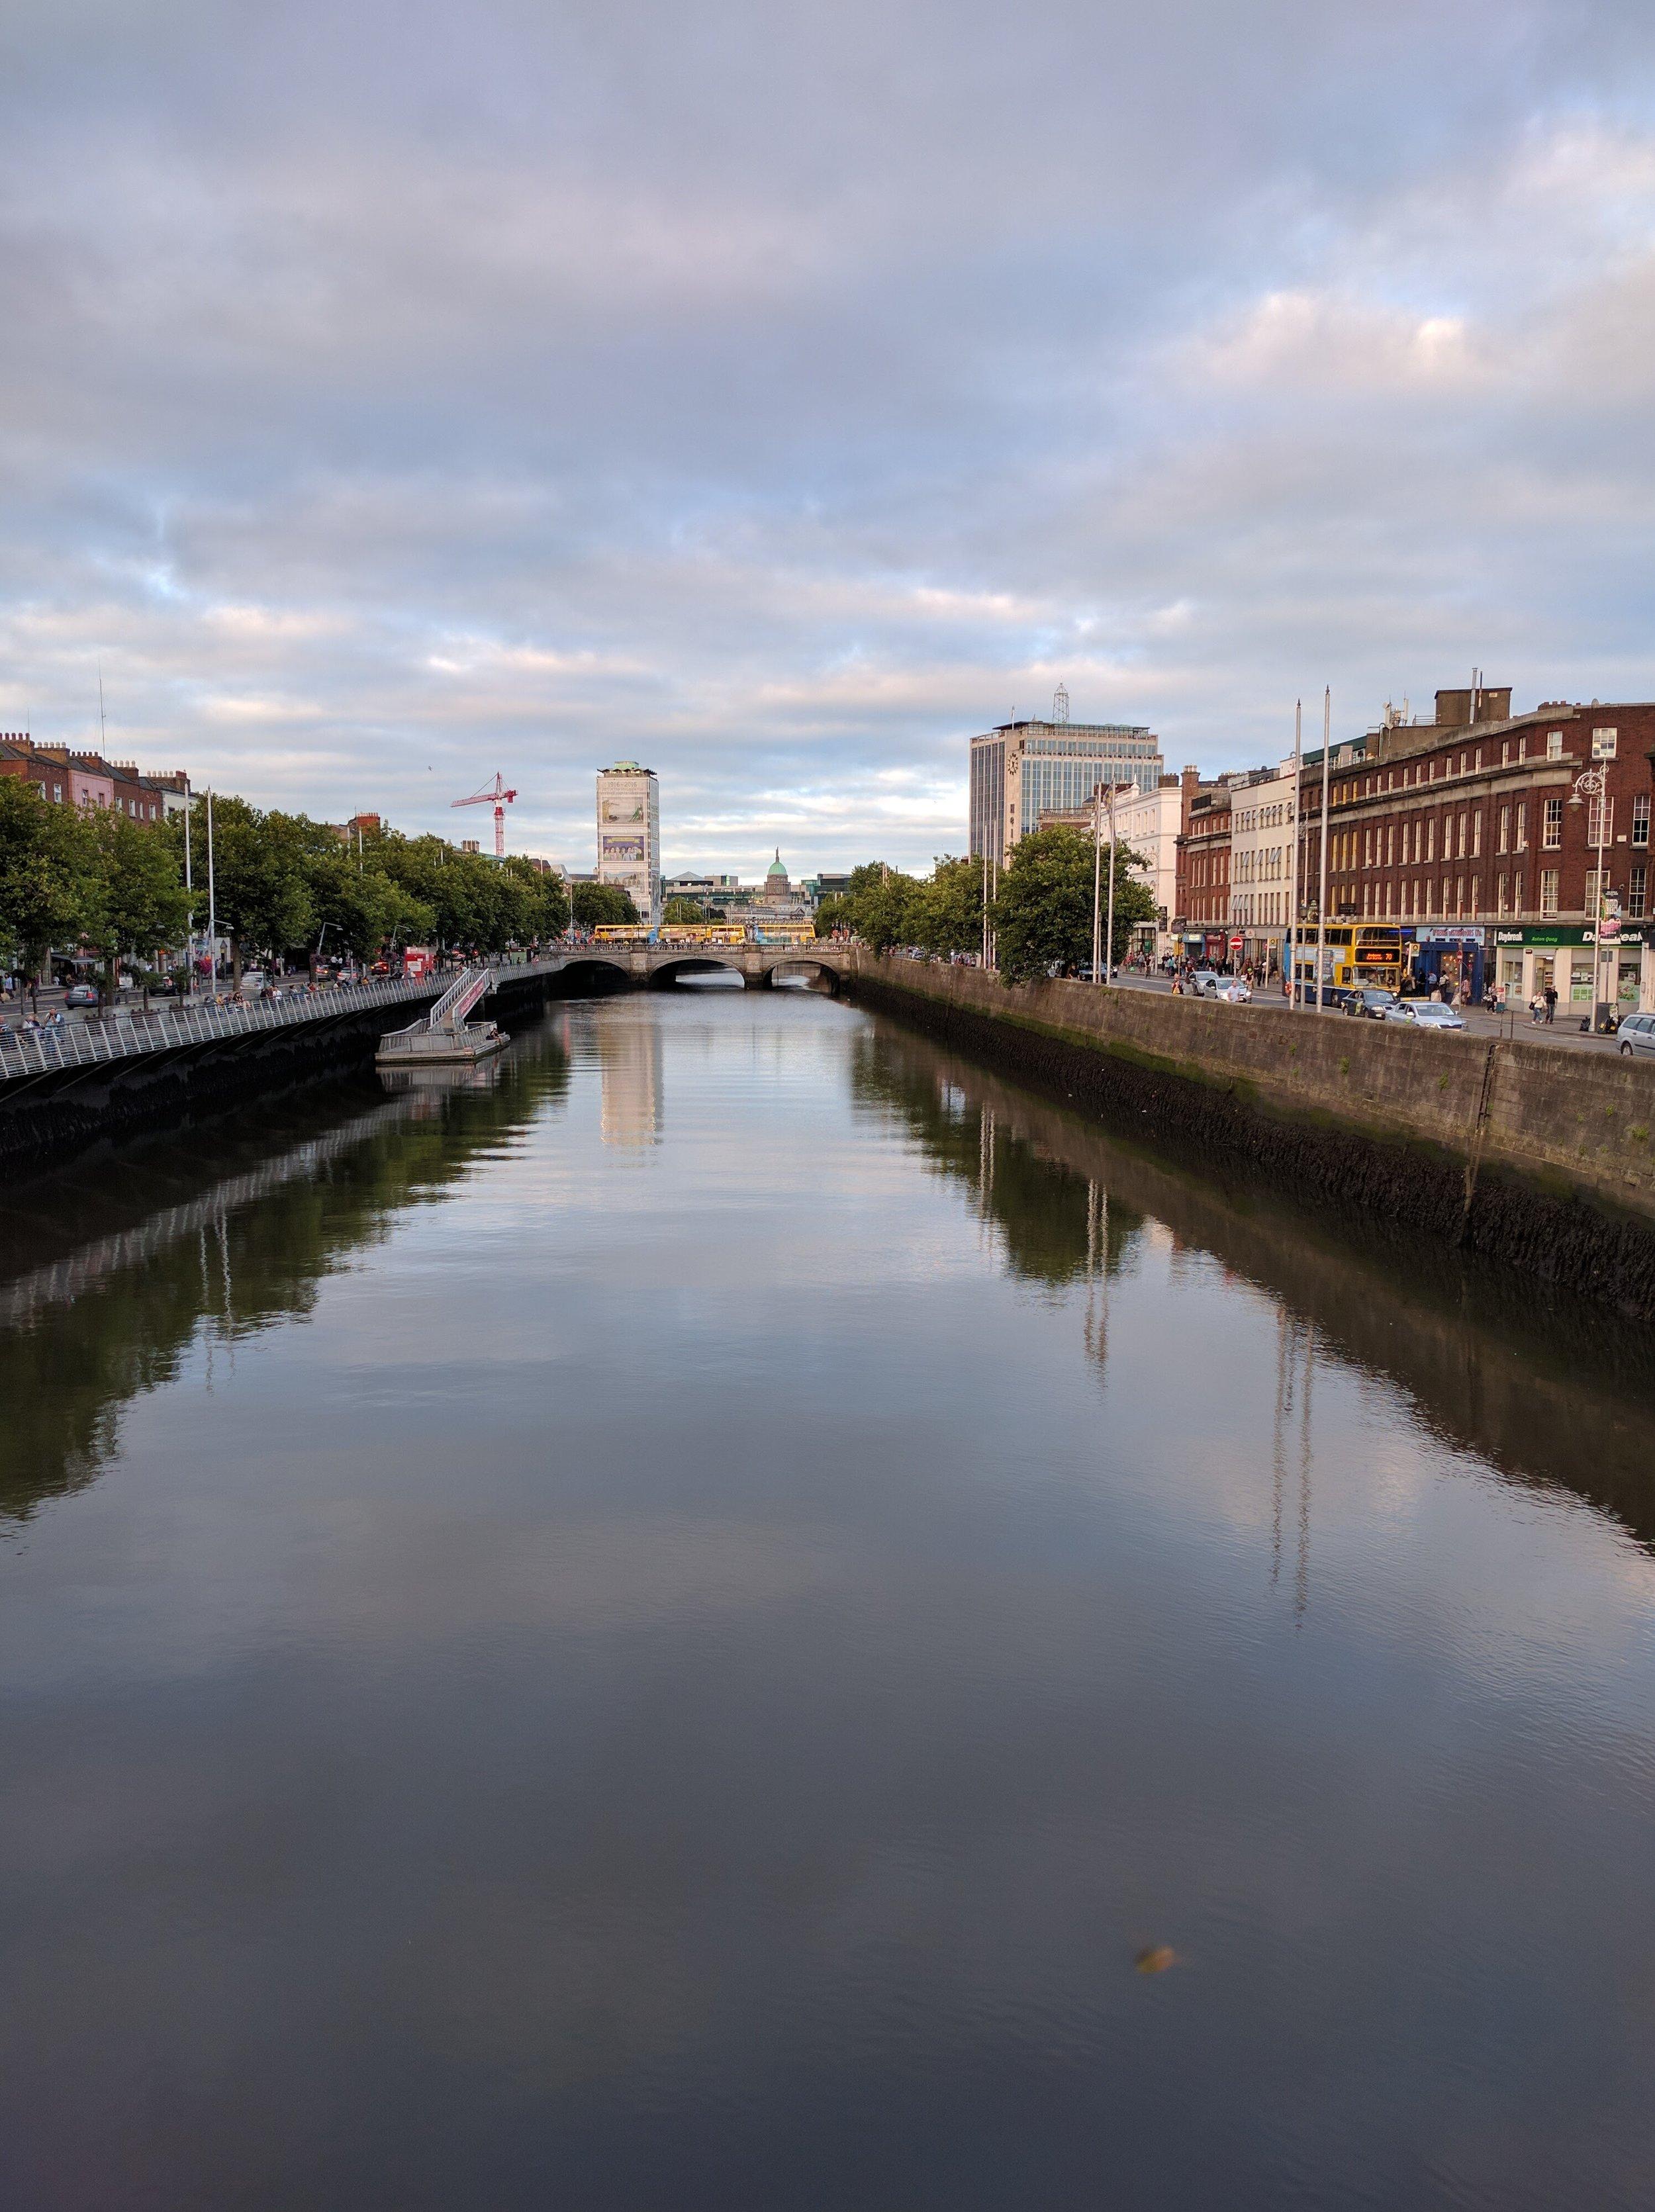 The River Liffey through Dublin